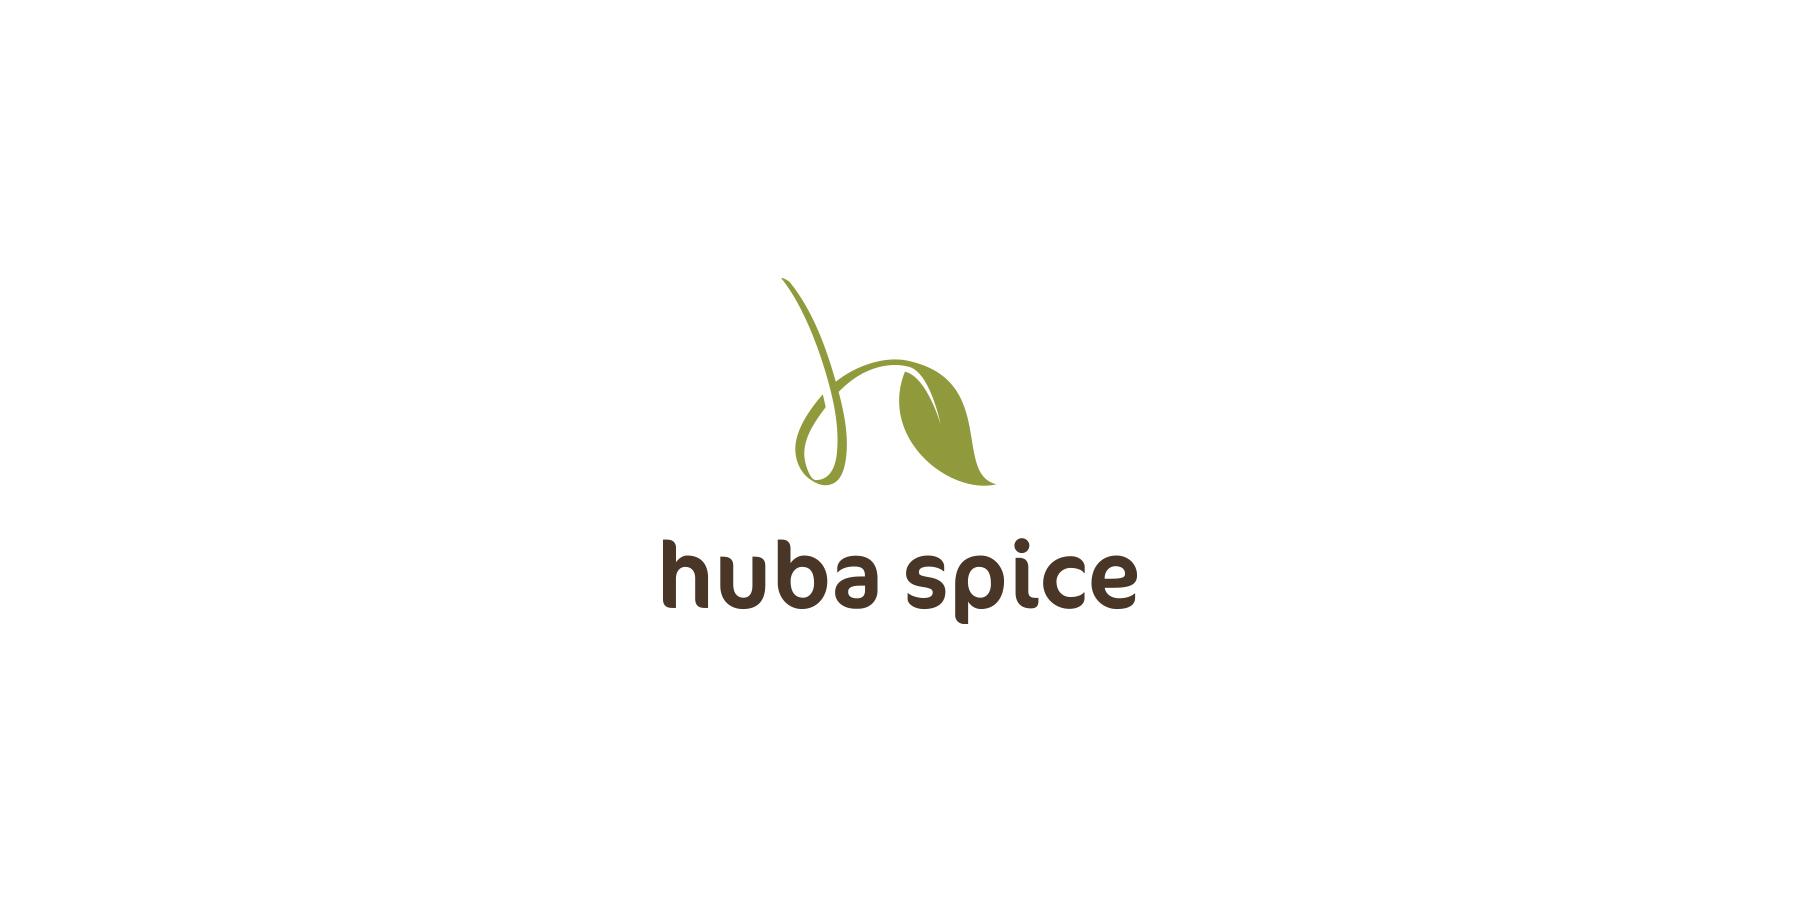 huba-spice-logo-design-01